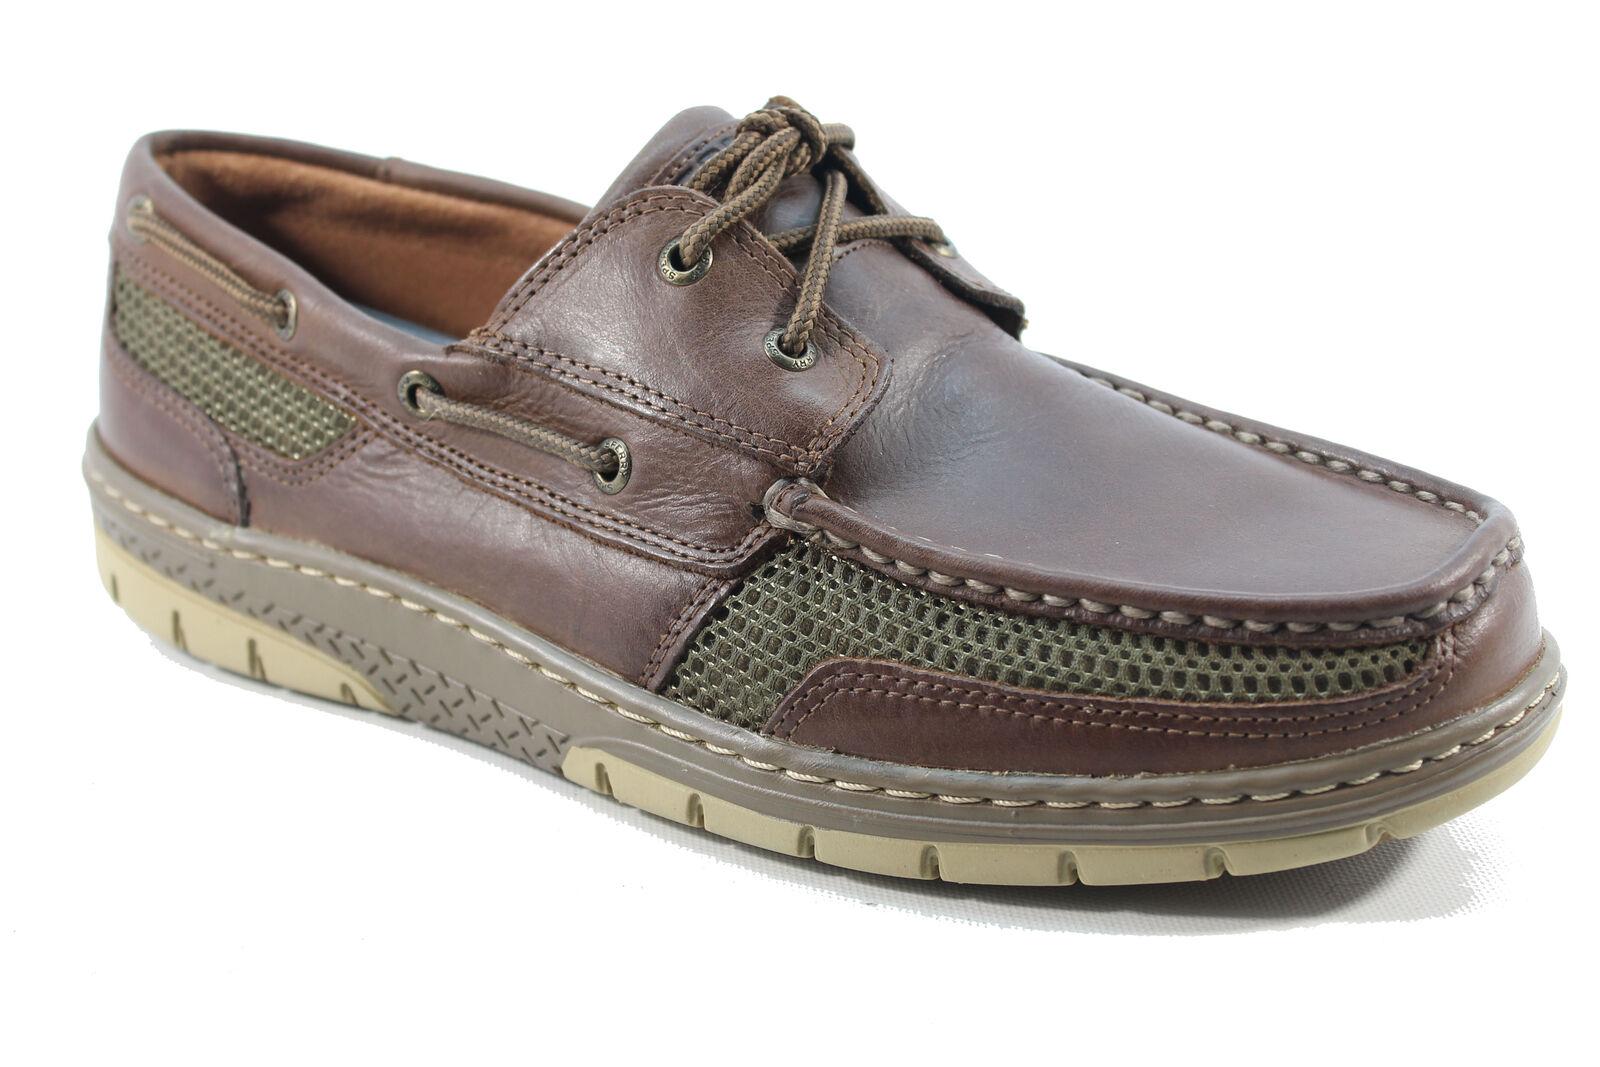 Sperry Top-Sider Men's Tarpon Ultralite Dark Brown Boat Shoes NWB